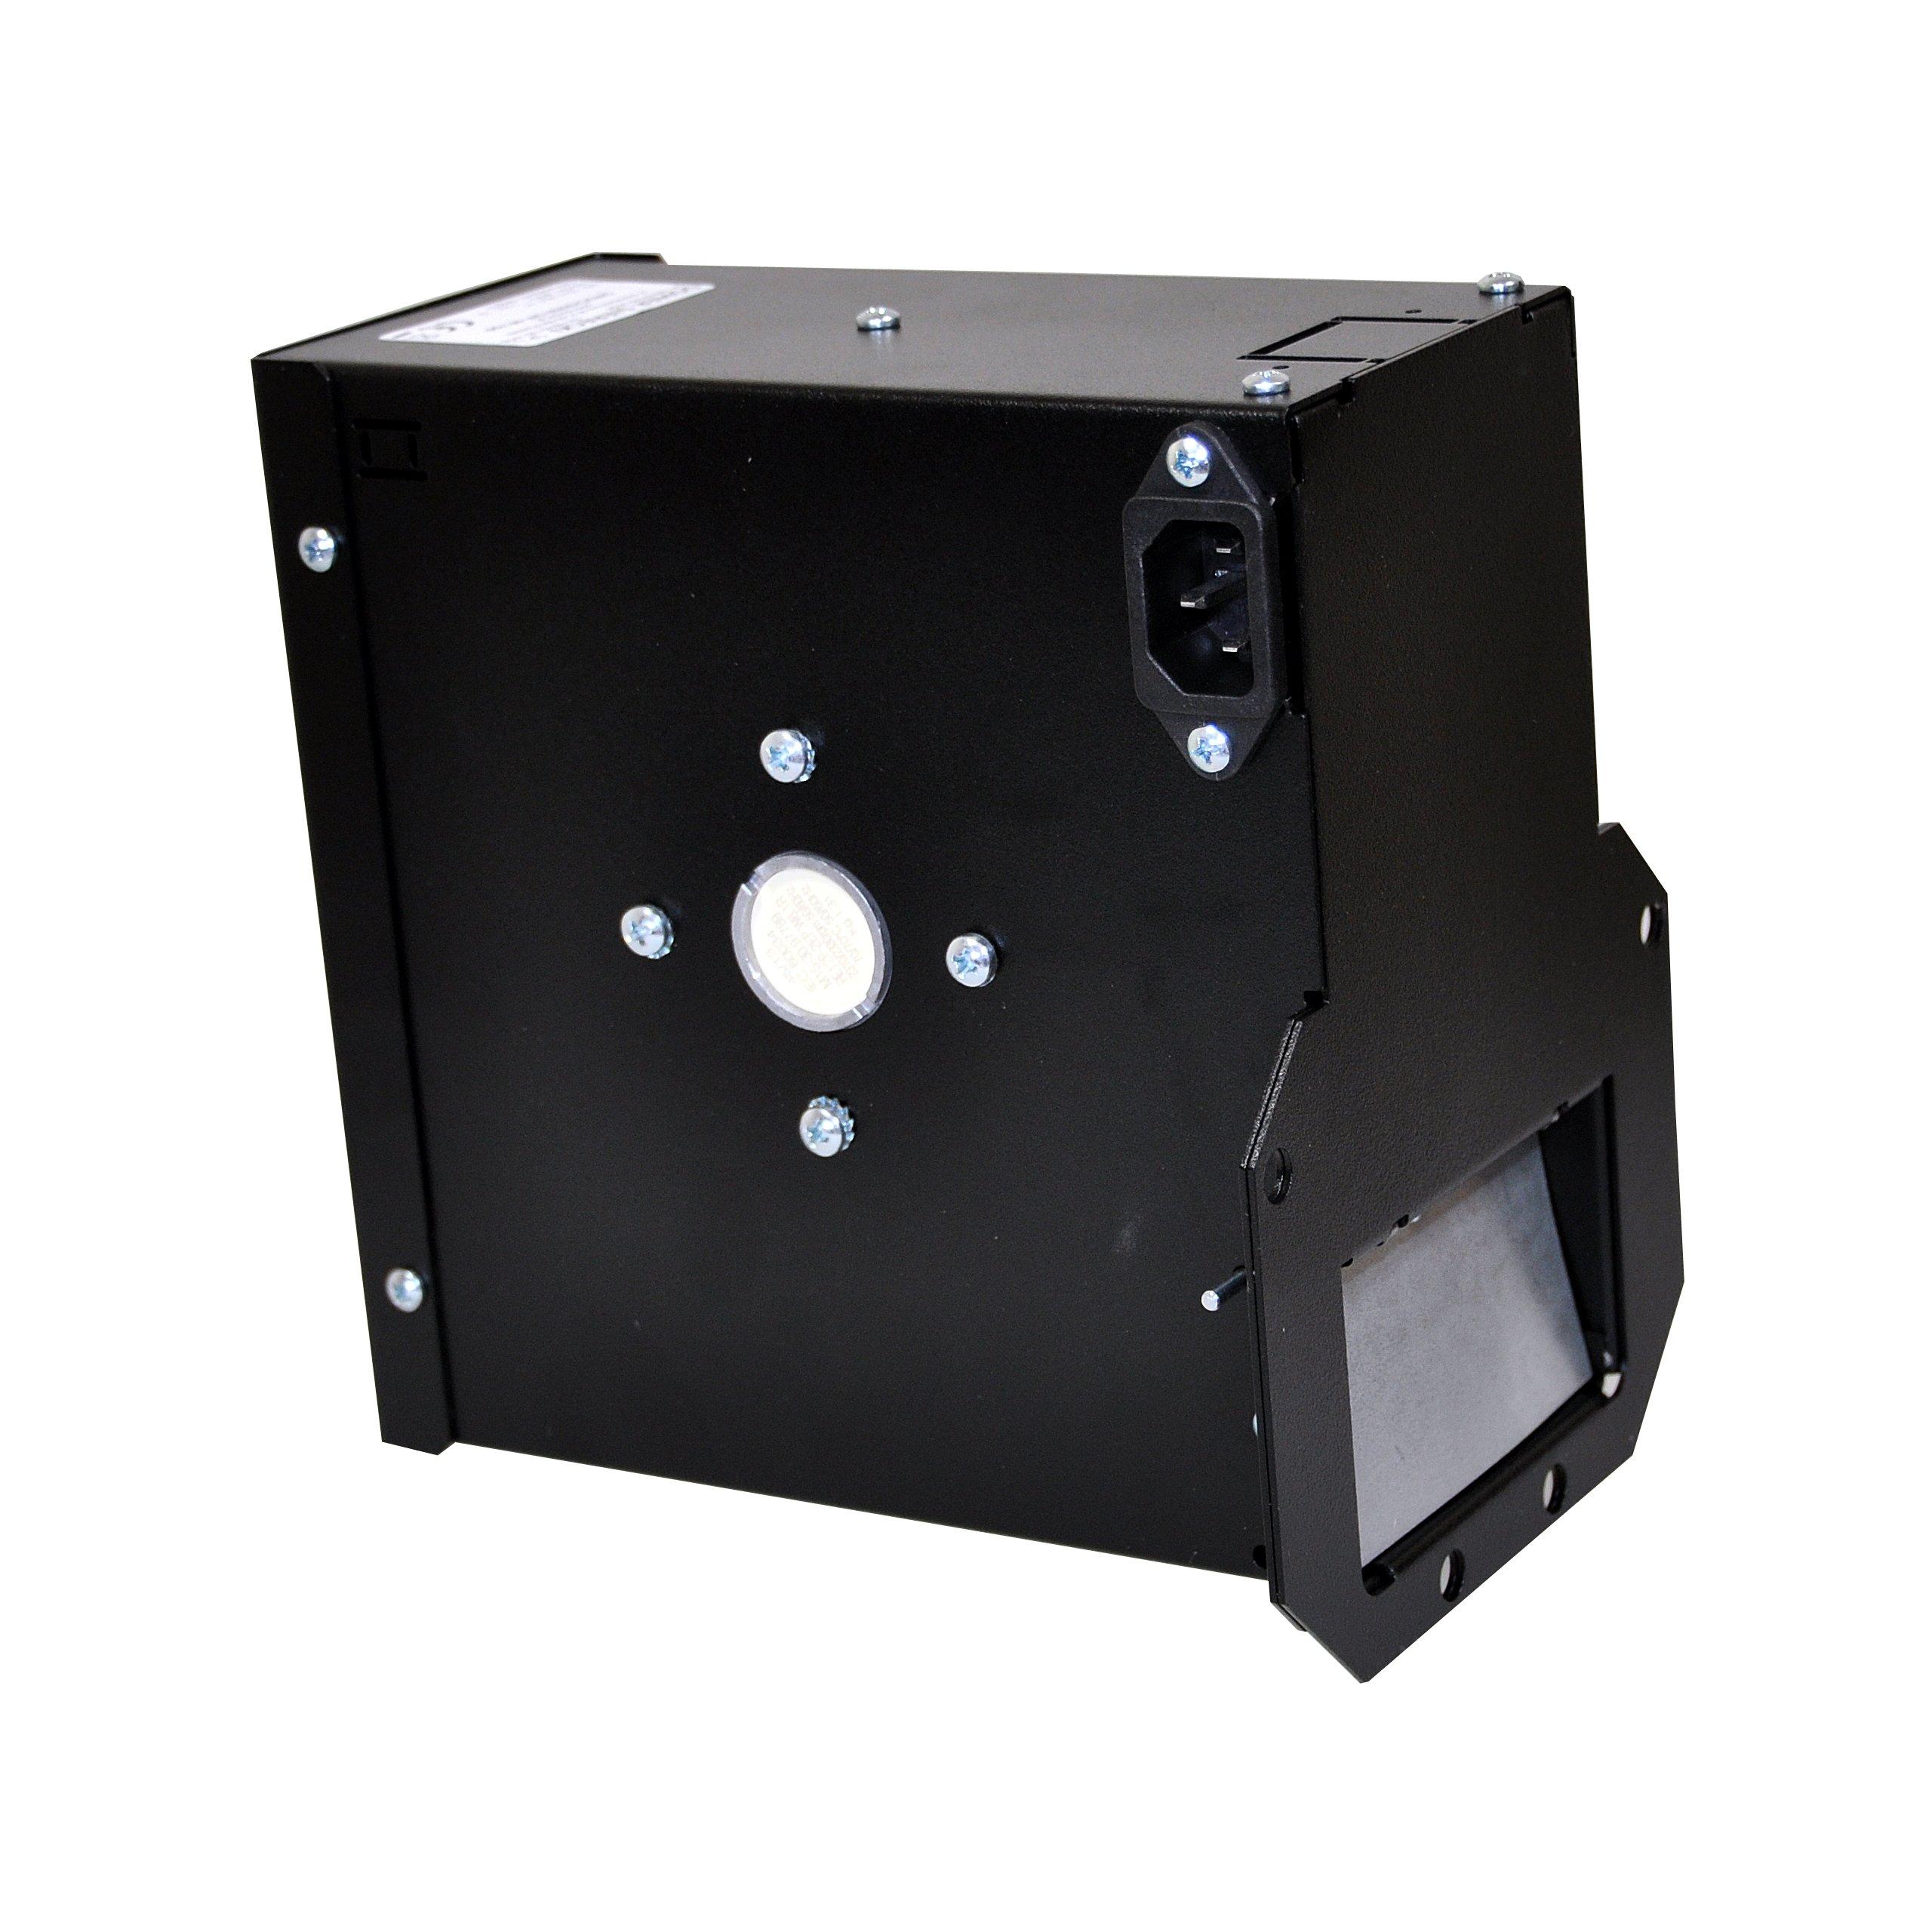 Dúchadlo pre pec kotla DM 44 kpp DOMER Metrix Brand Domer